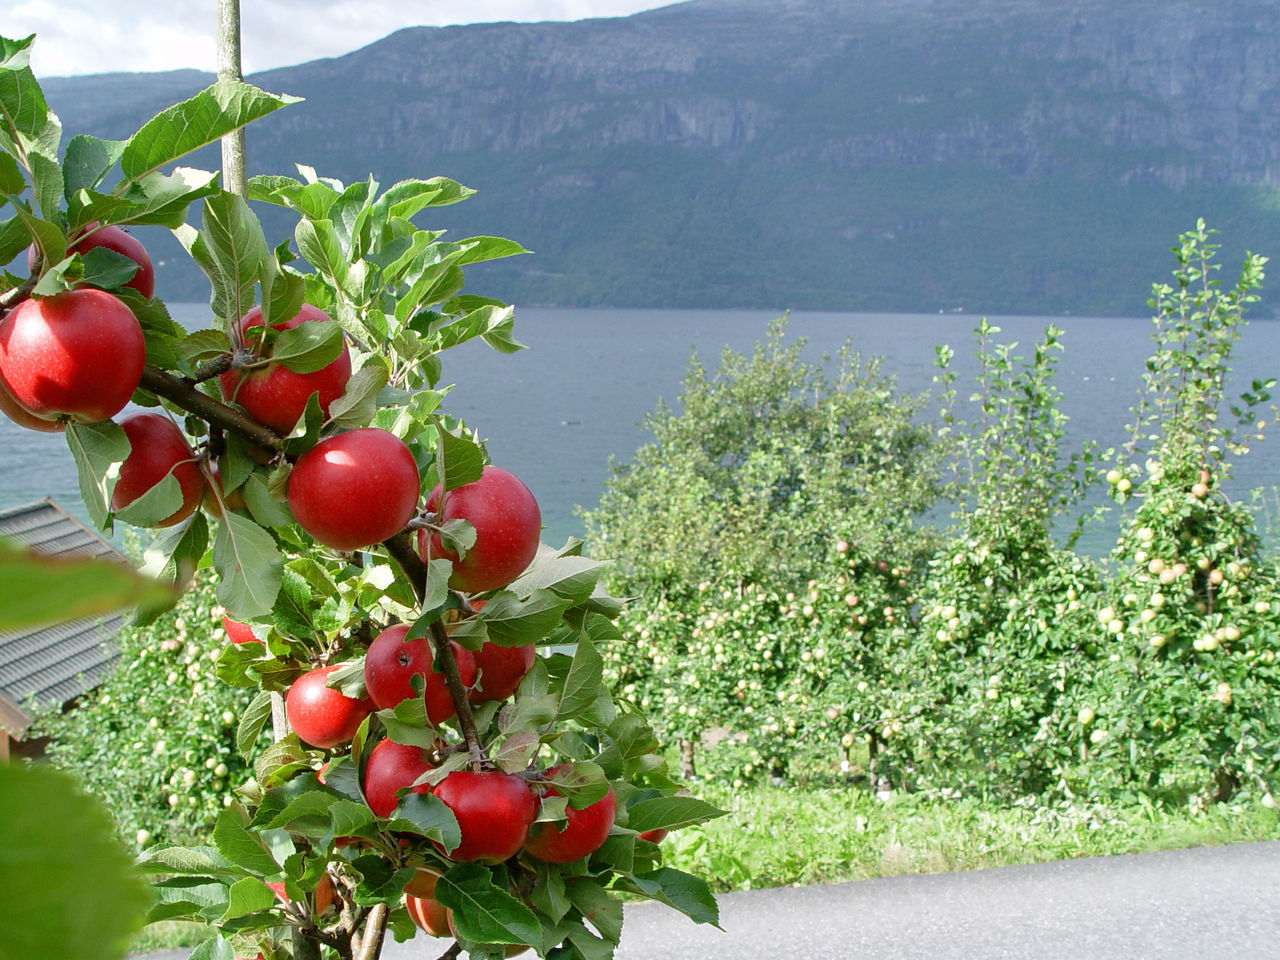 RED BERRIES GROWING ON PLANTS